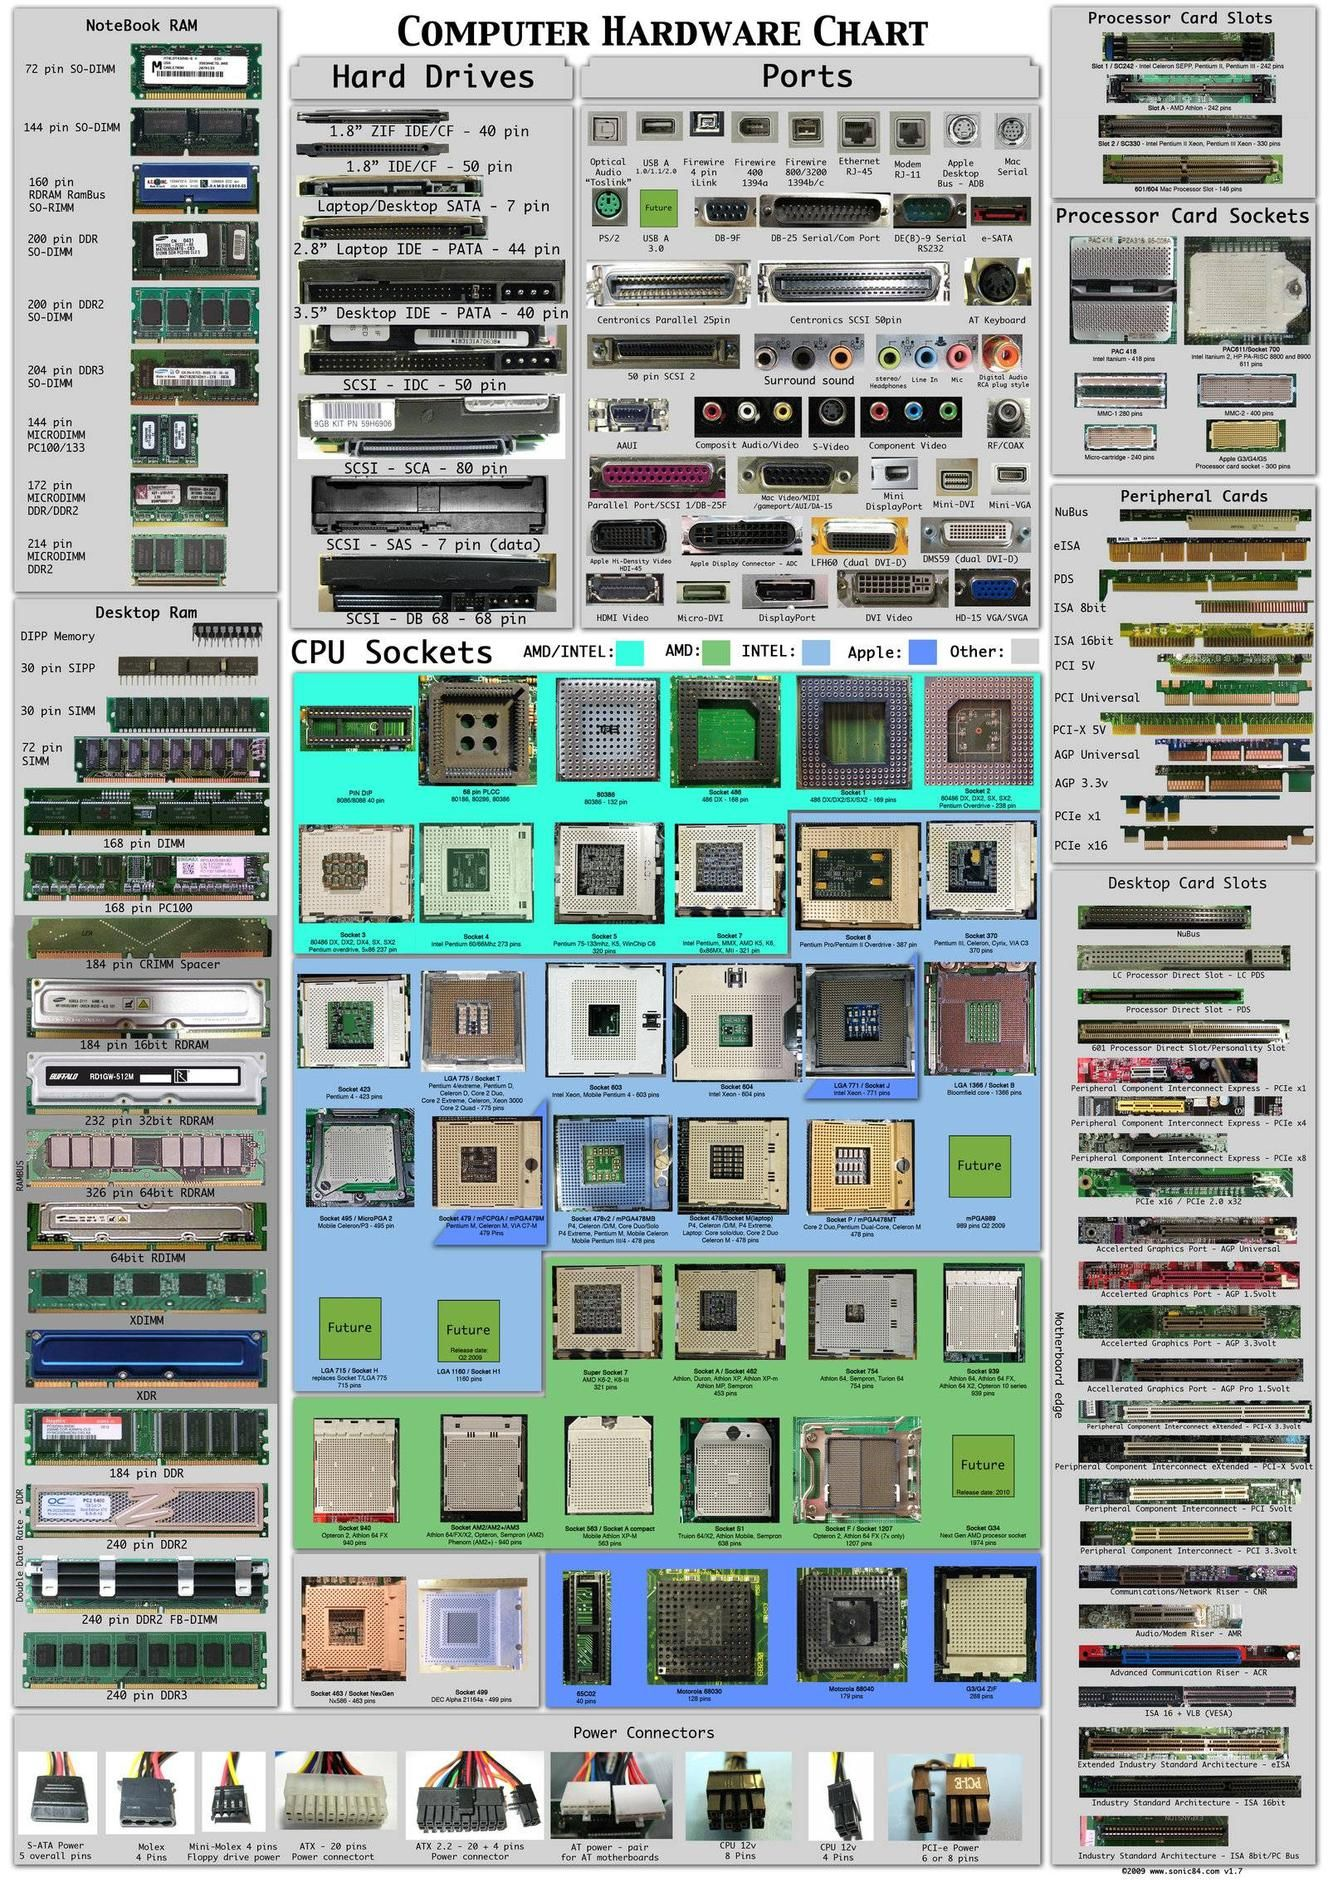 Lpt Computer Hardware Chart Computer Hardware Computer Technology Computer Knowledge